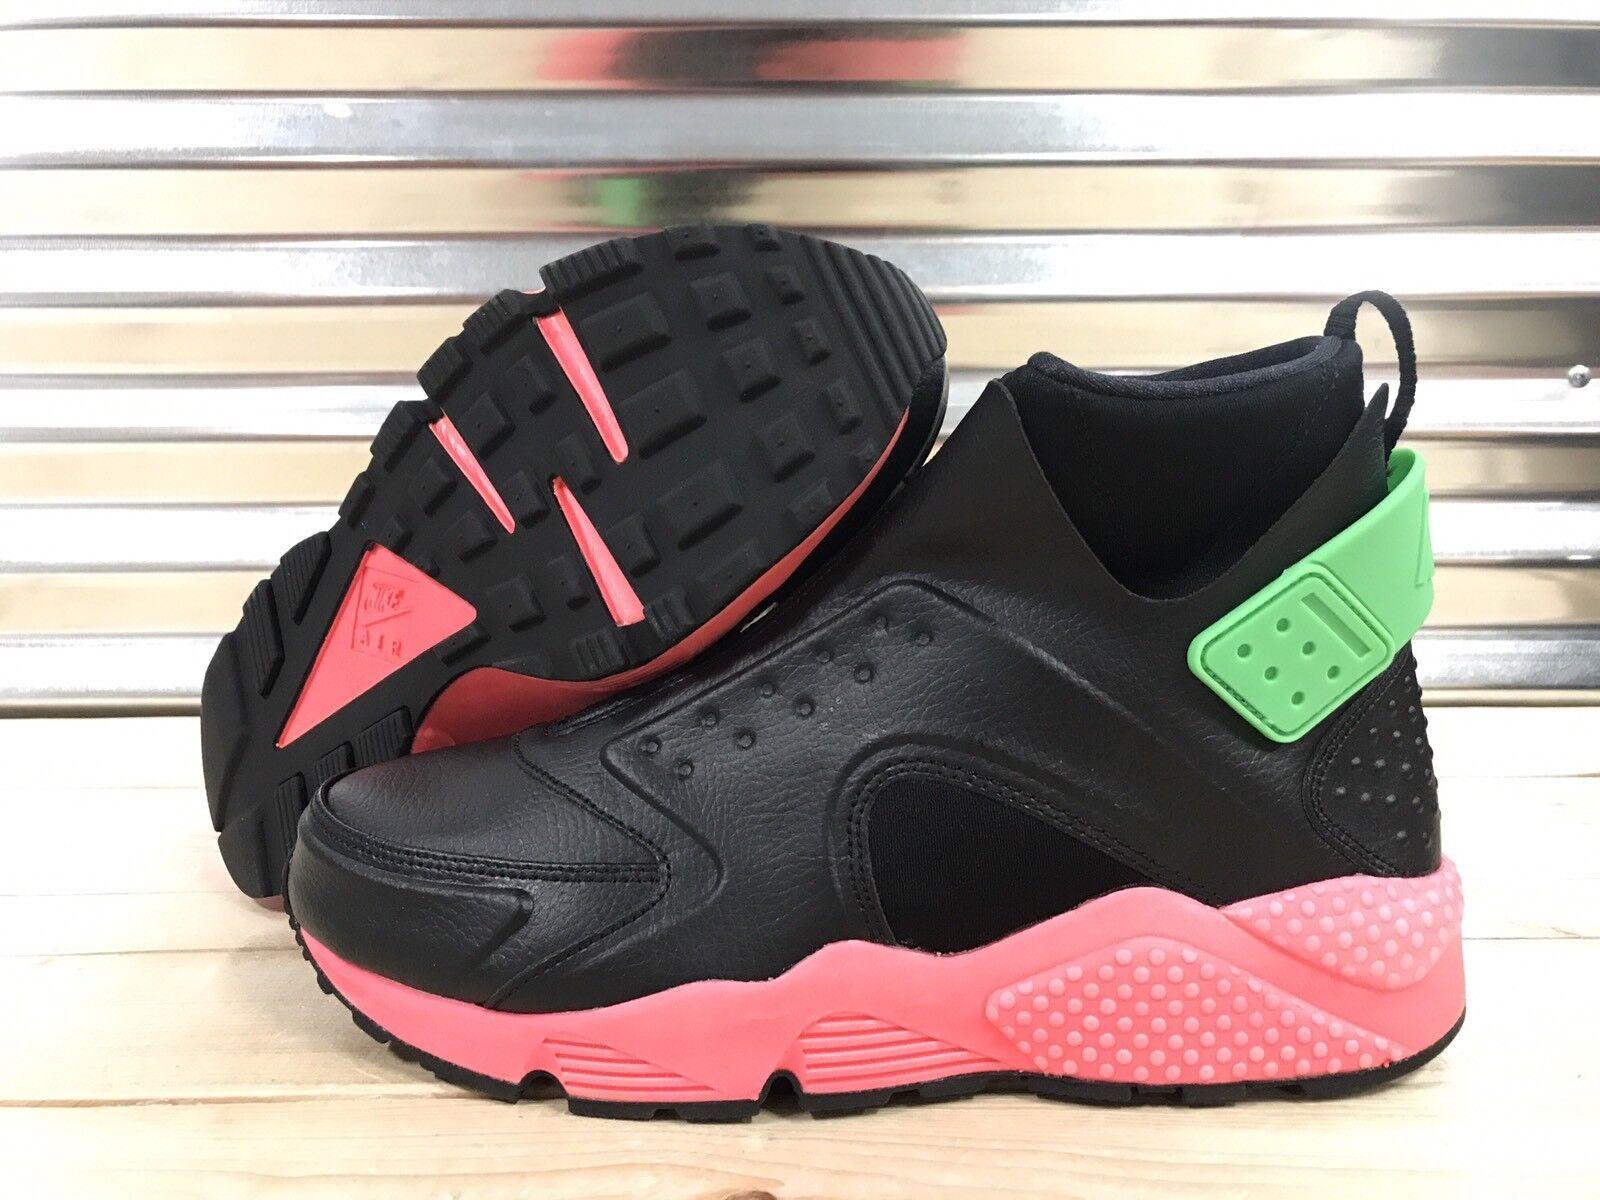 brand new 05121 e76f9 WMNS Nike Air Huarache Run Mid Black Trainers Hot Punch SZ 11 ( 807313-003 )